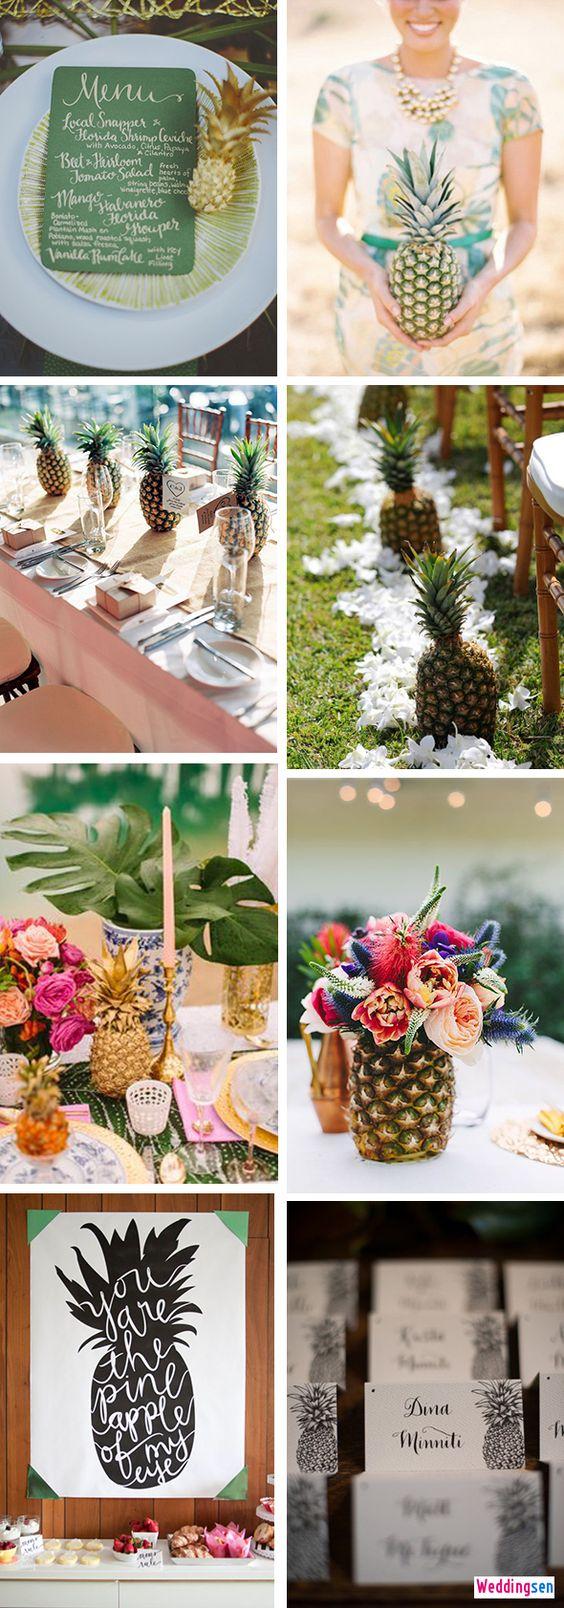 Pineapple Wedding Inspiration + Suggestions - http://www.weddingsen.com/wedding-dress-ideas/pineapple-wedding-inspiration-suggestions.html